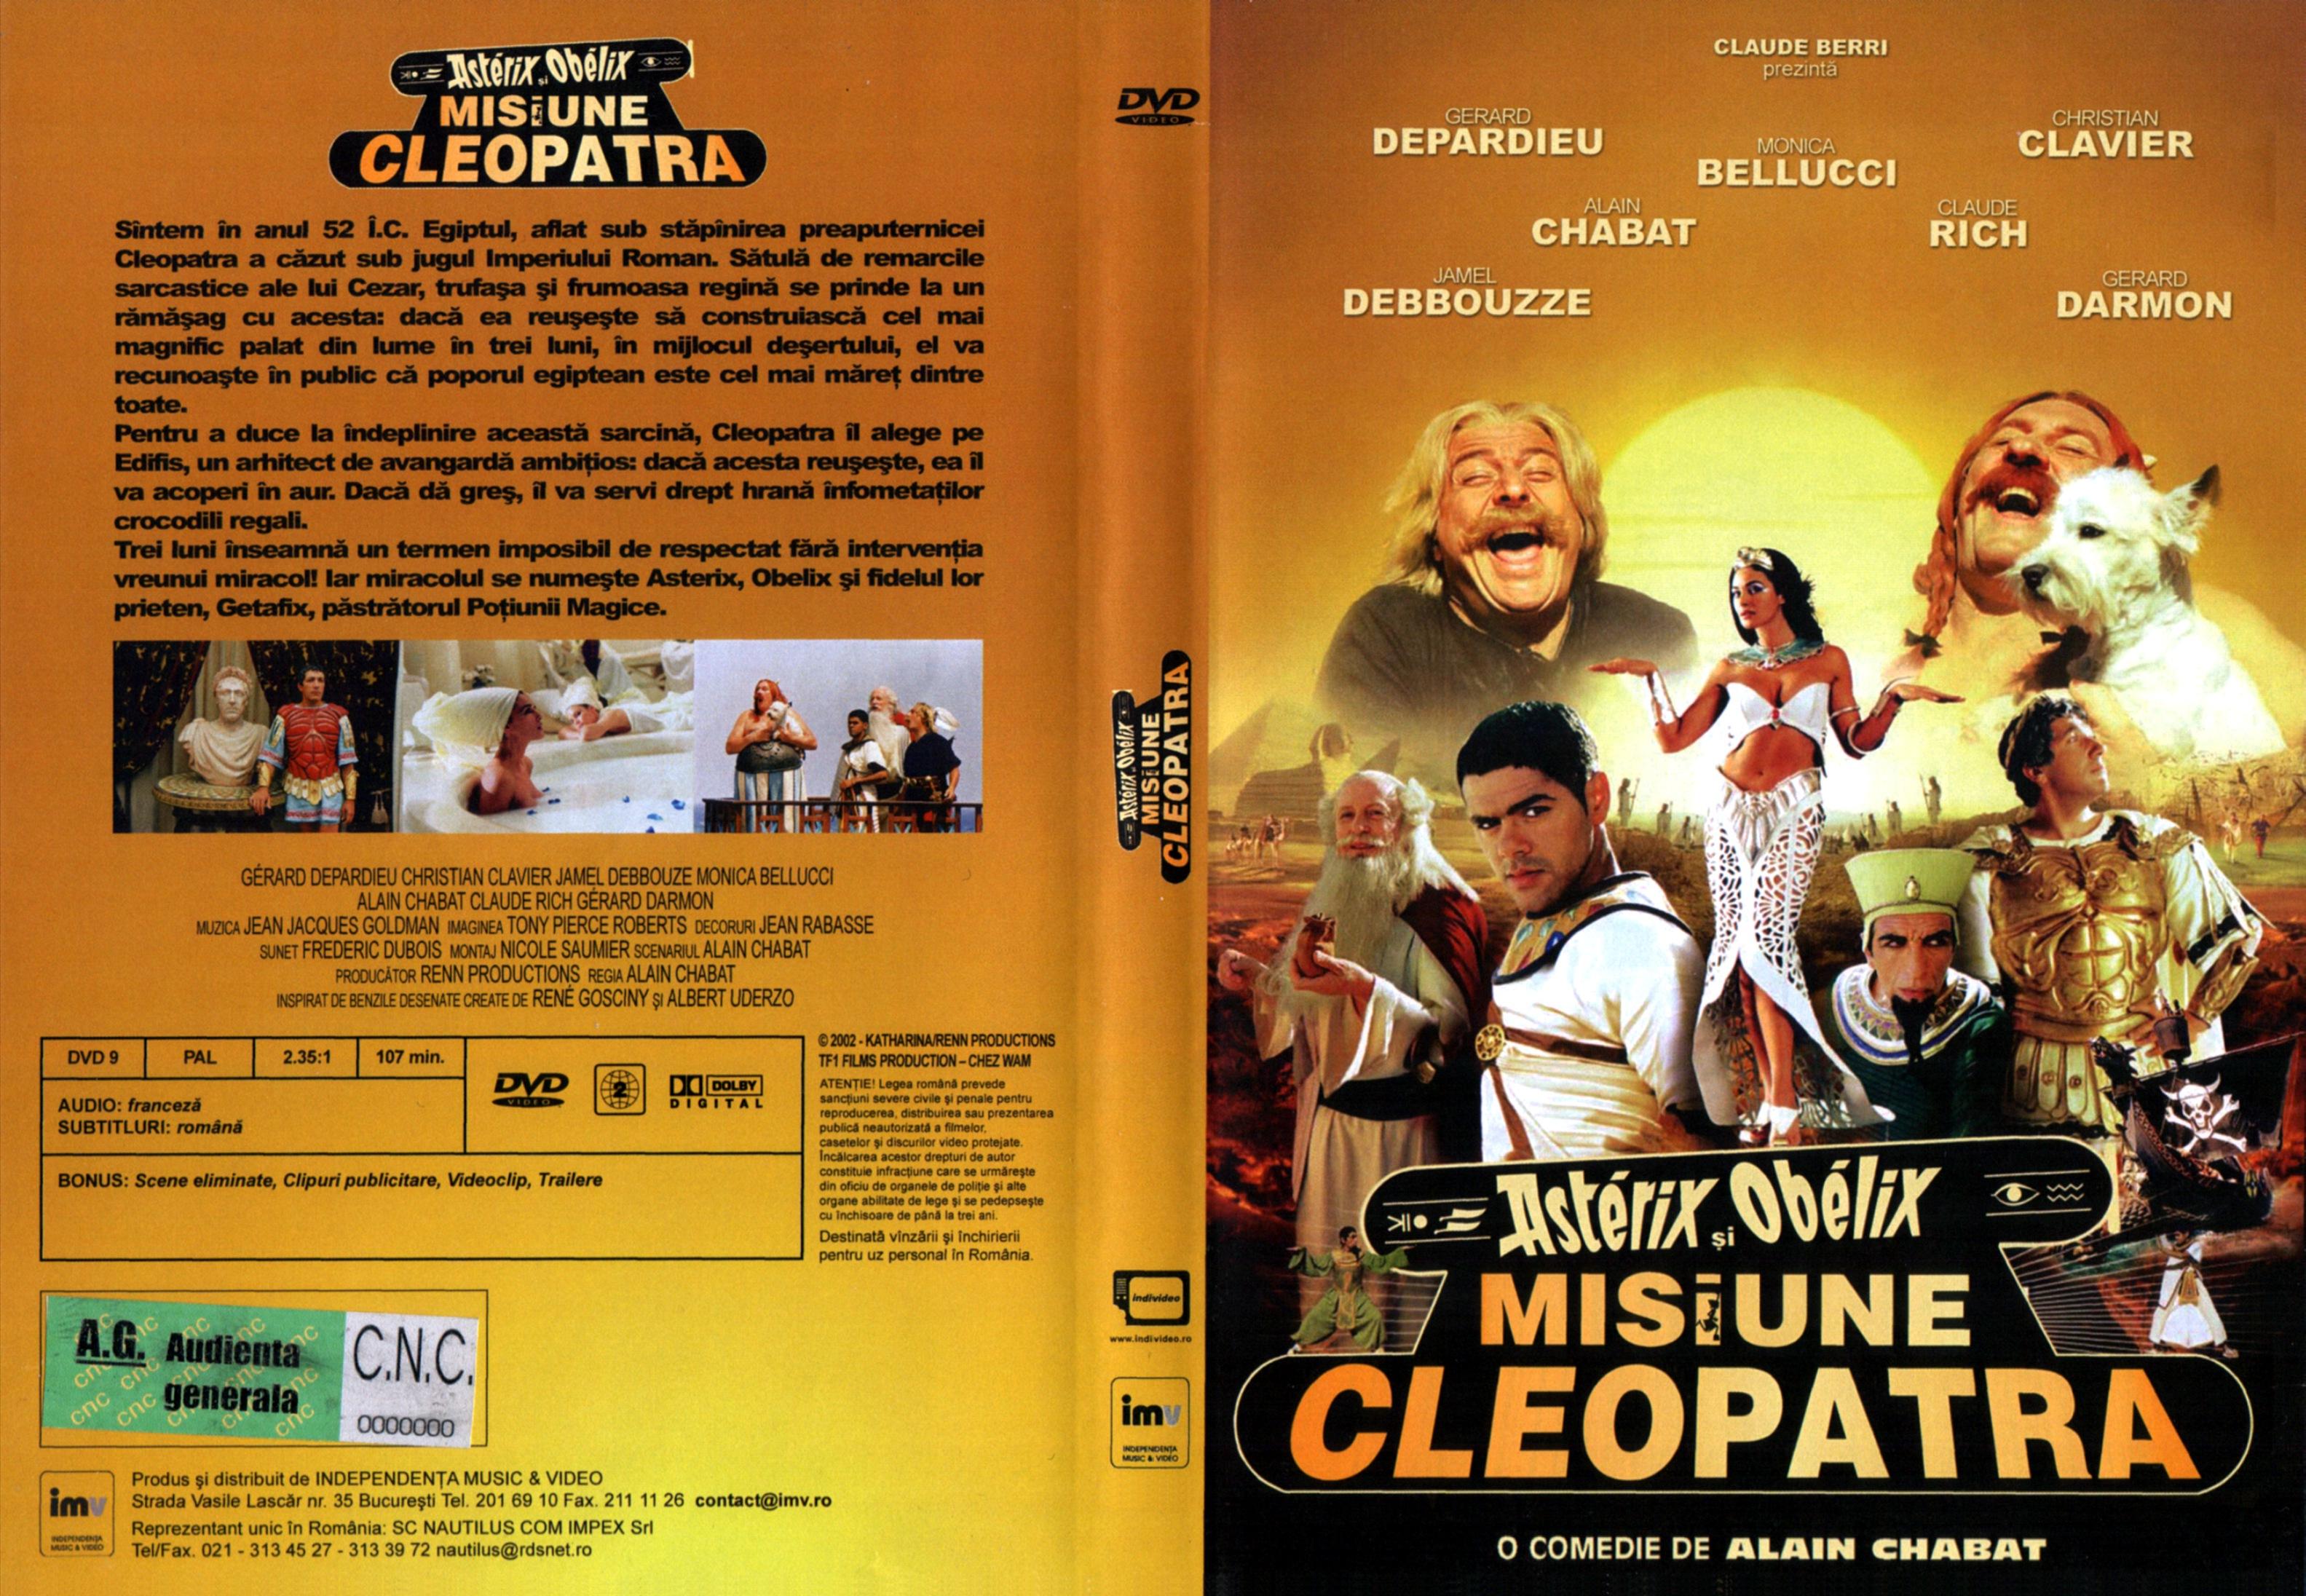 Asterix And Obelix Mission Cleopatra Download